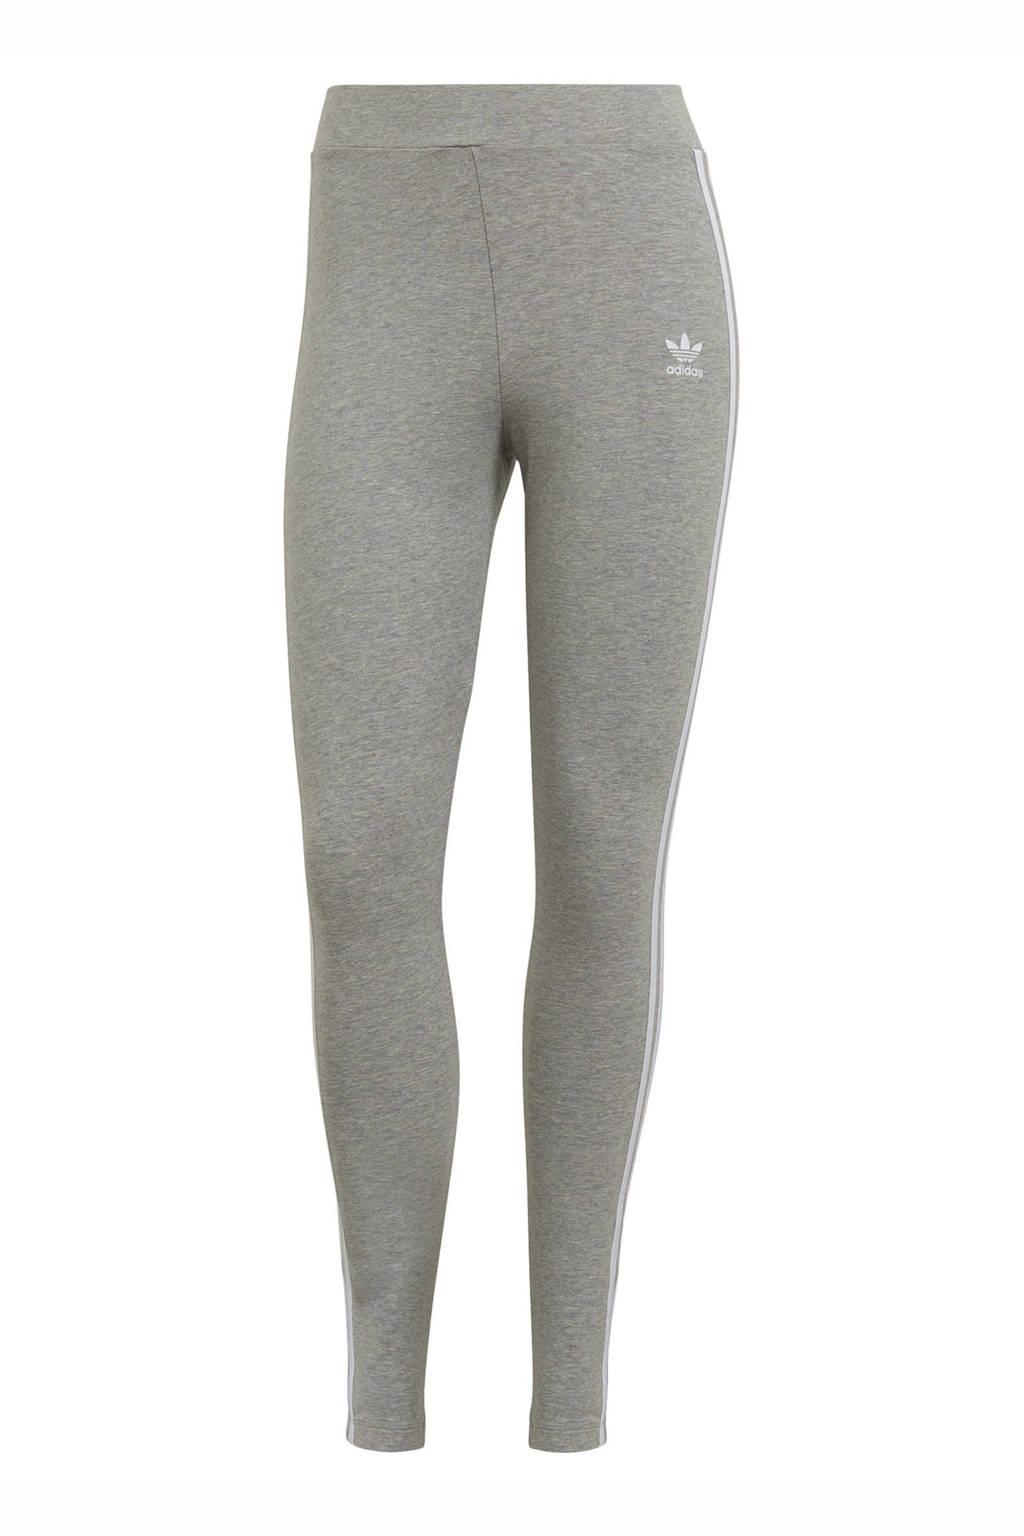 adidas Originals Adicolor legging grijs melange, Grijs melange